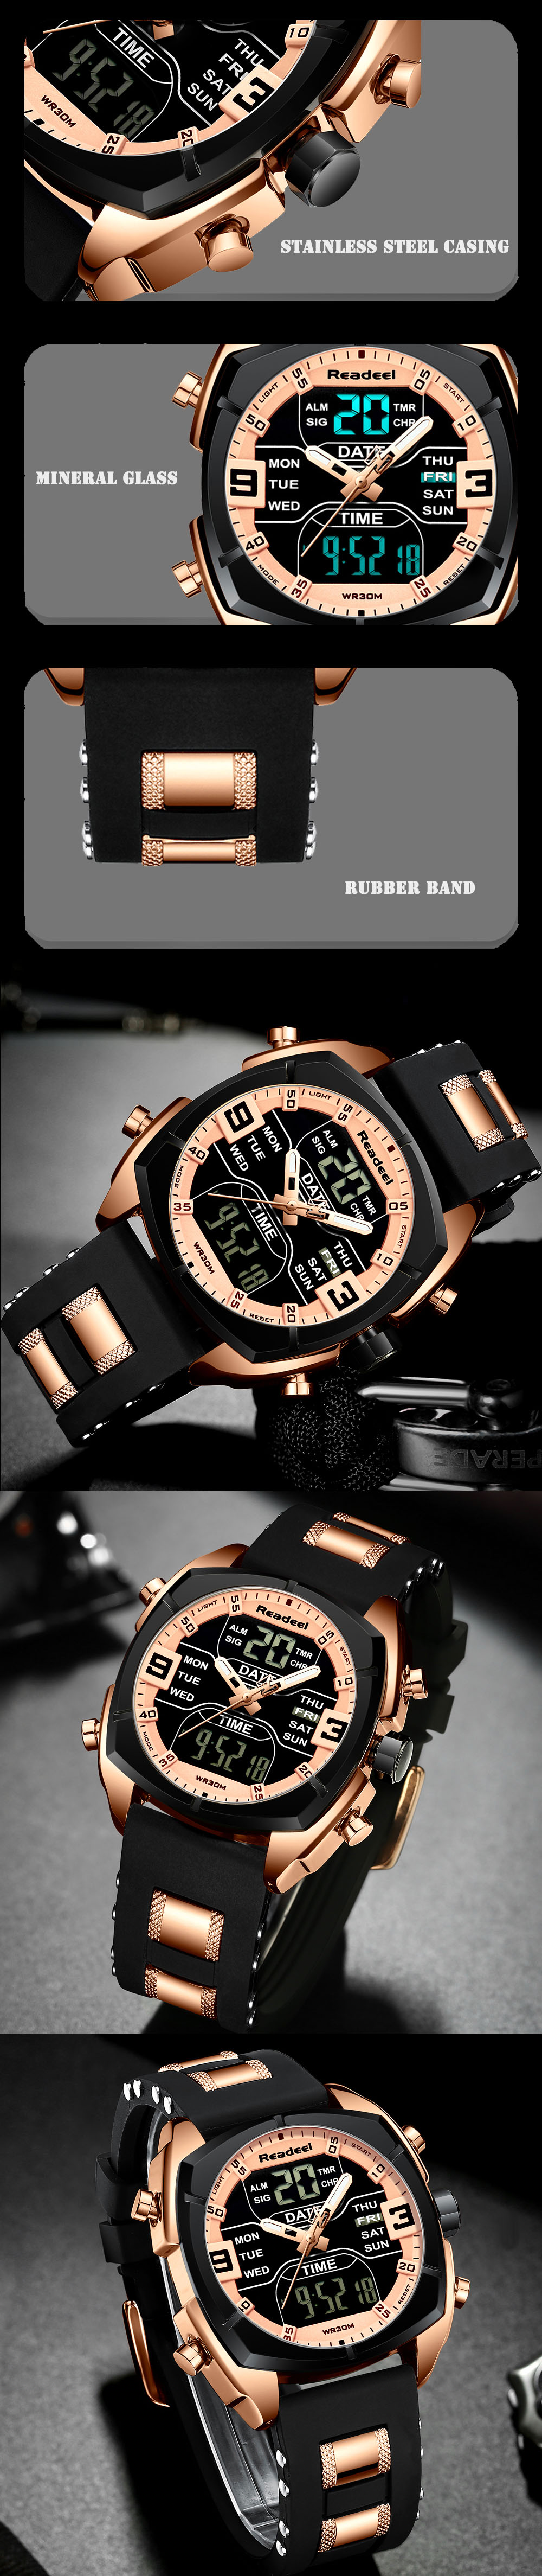 H9eb794f2cbf3487fadec0cb9165aad5eh Mens Watches Luxury Brand Men Sports Watches Men's Quartz LED Digital Clock Male Rubber Military Wrist Watch Relogios Masculinos